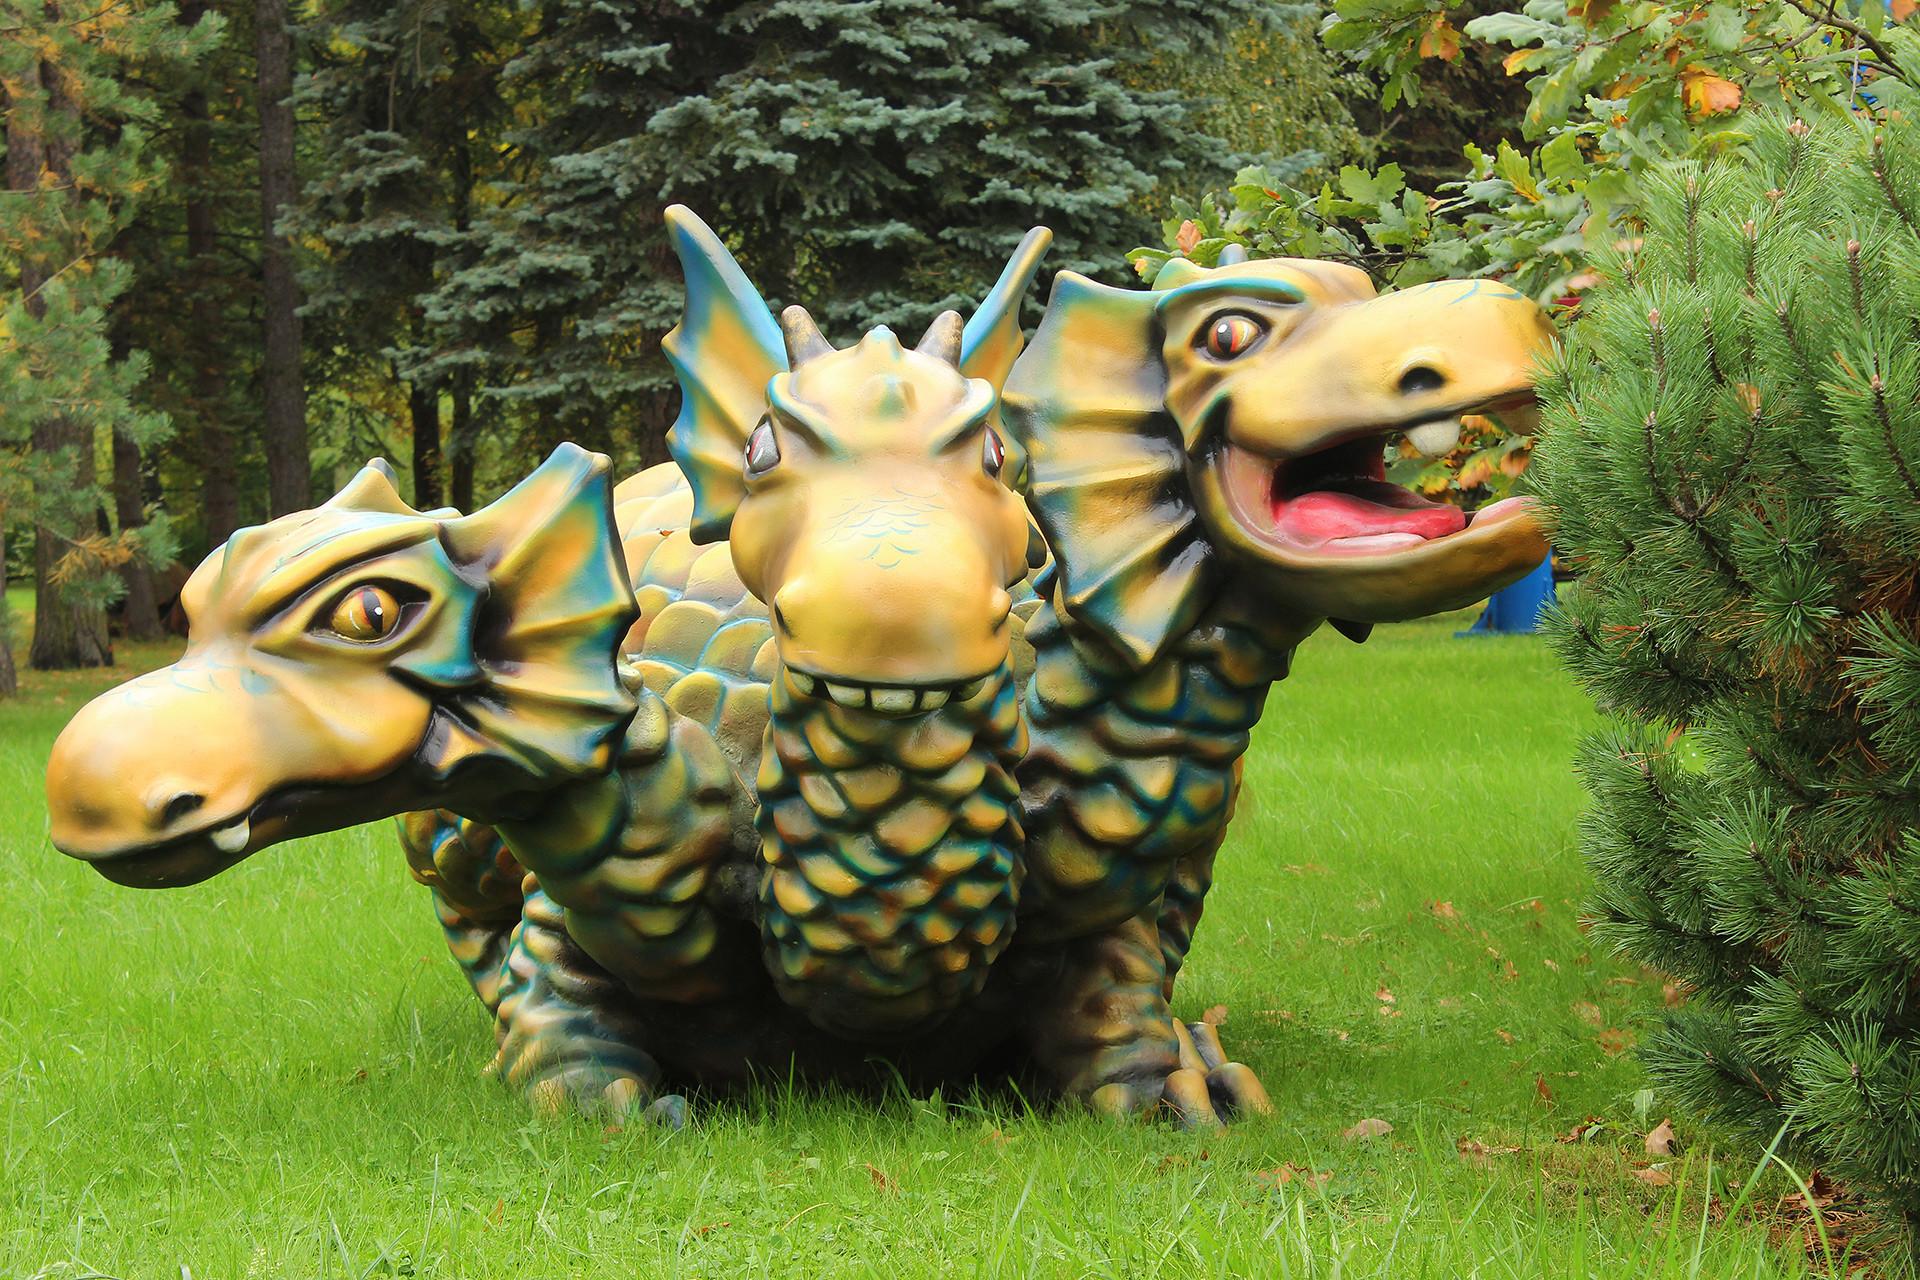 Zmey Gorynych at Divo-Ostrov park in St. Petersburg